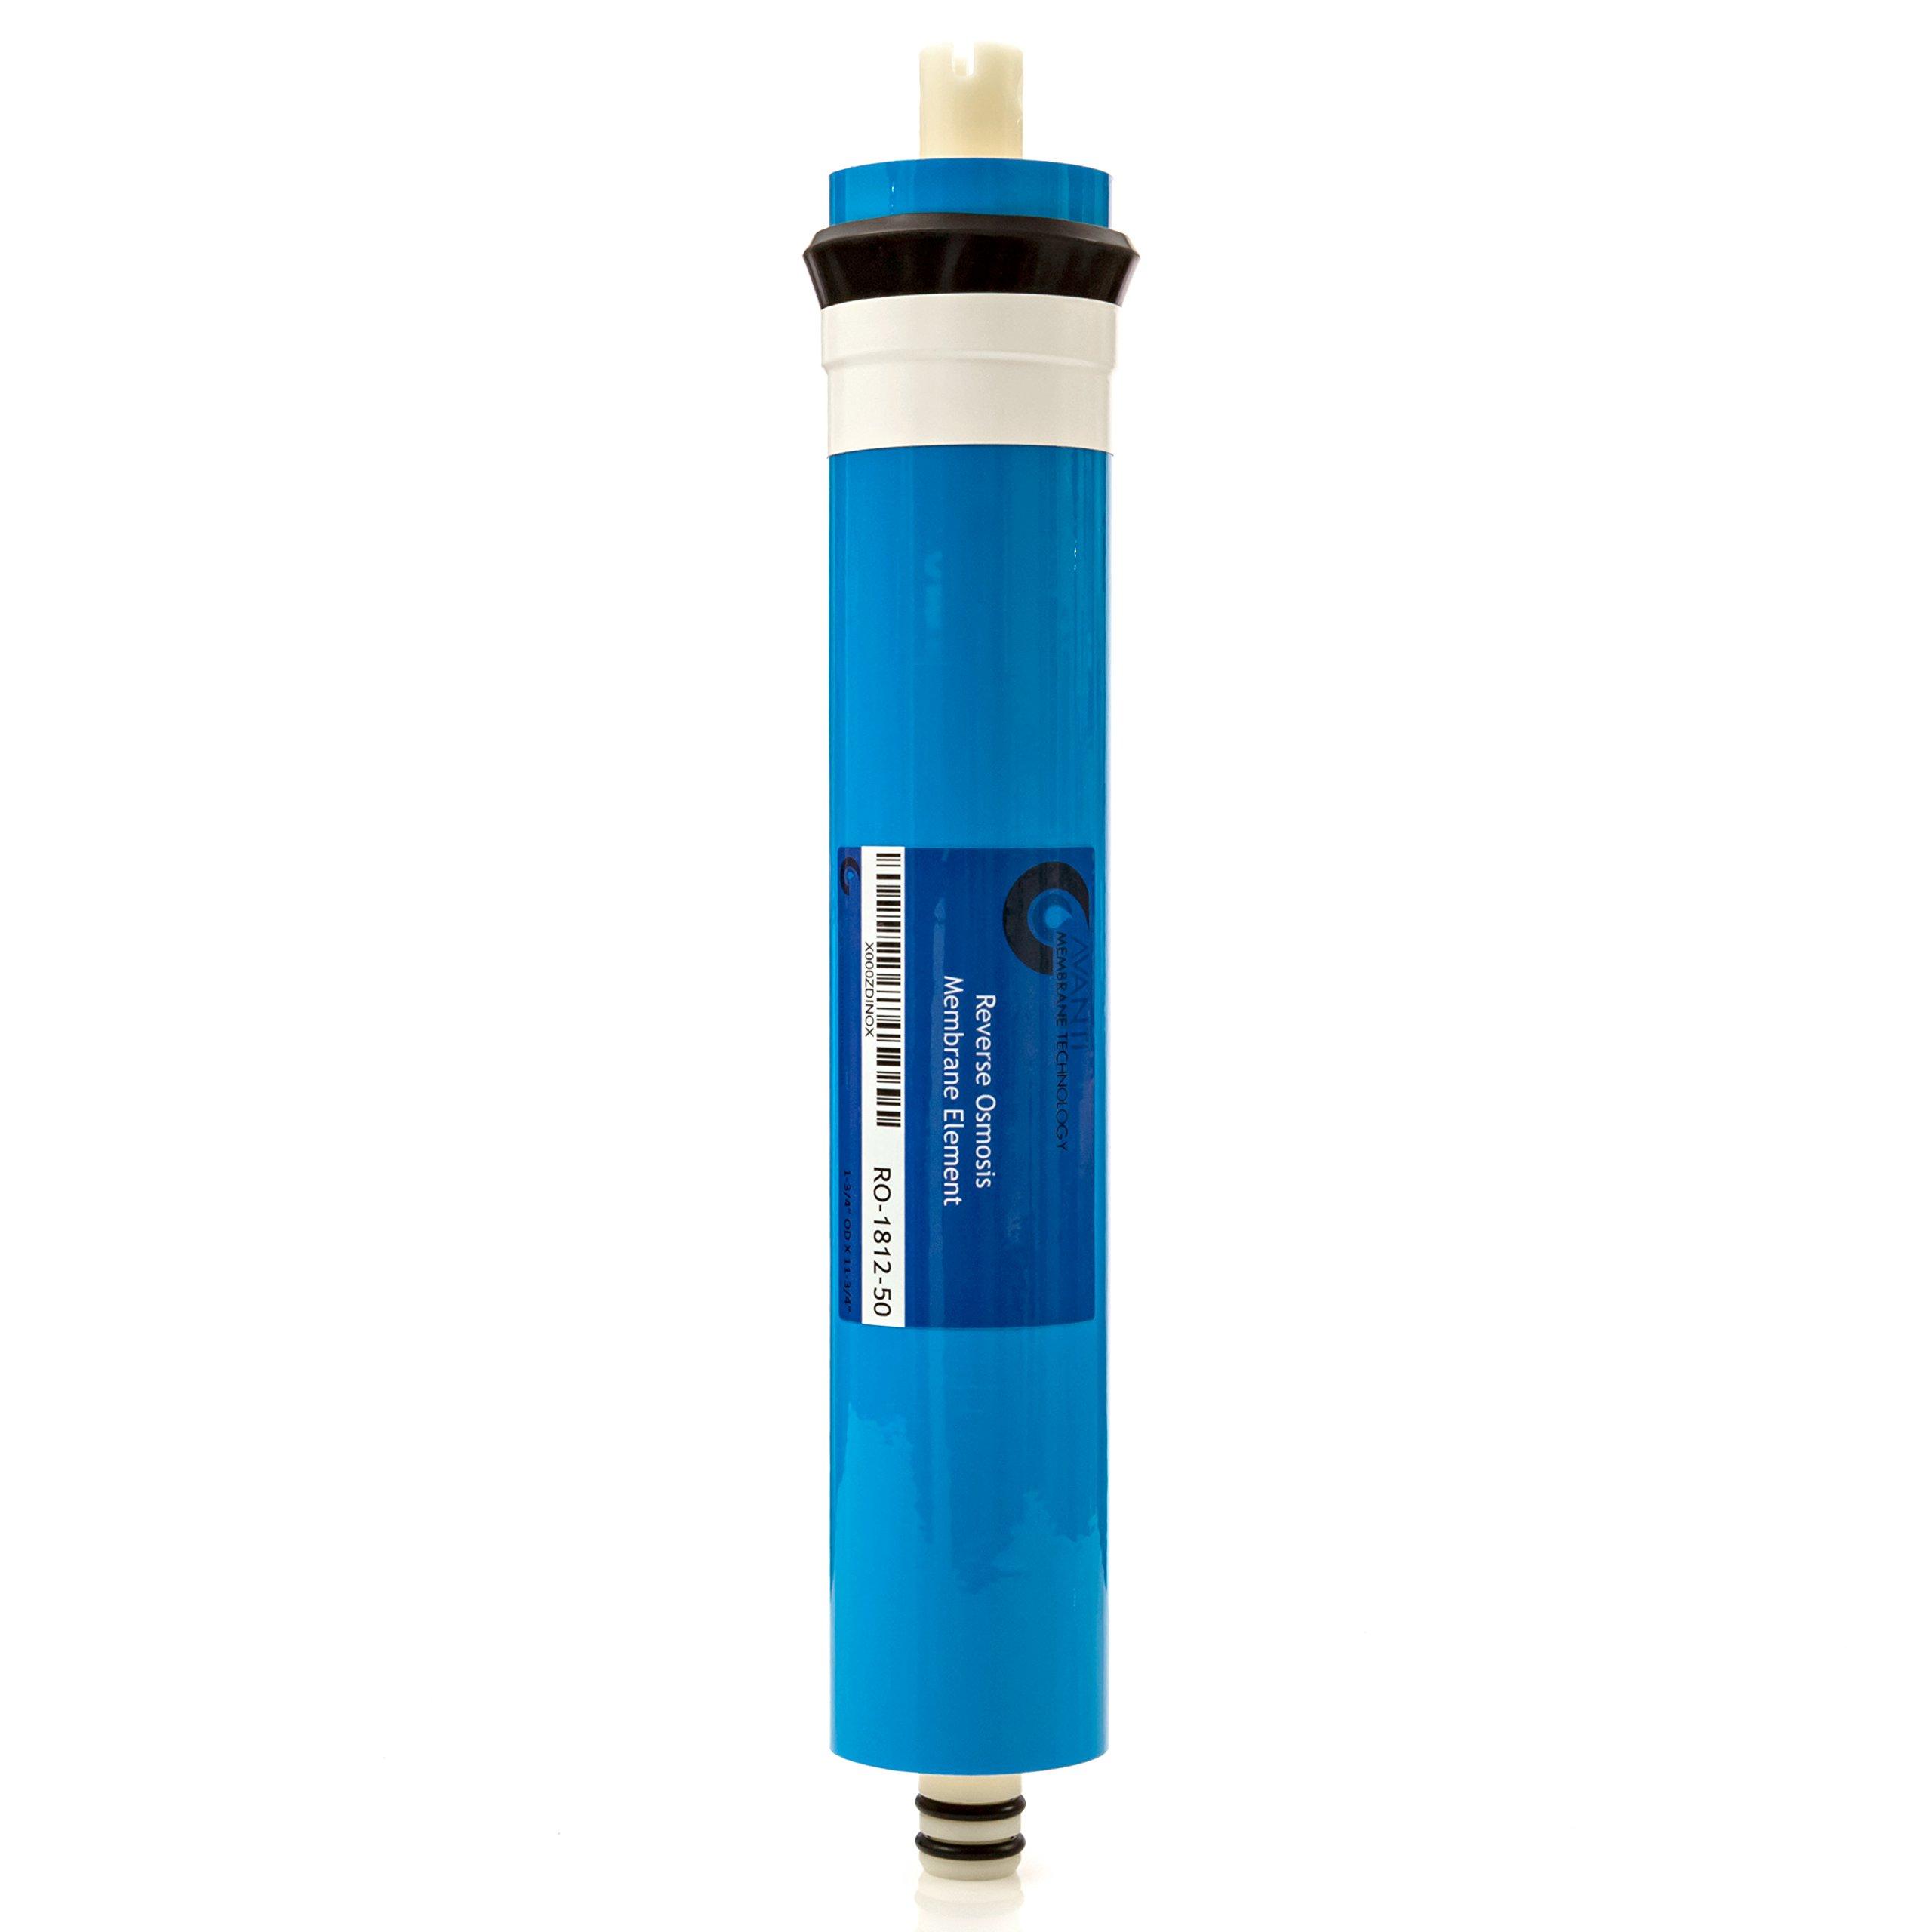 Watts Flowmatic Compatible 50 GPD TFC RO Membrane W-1812-50 by CFS